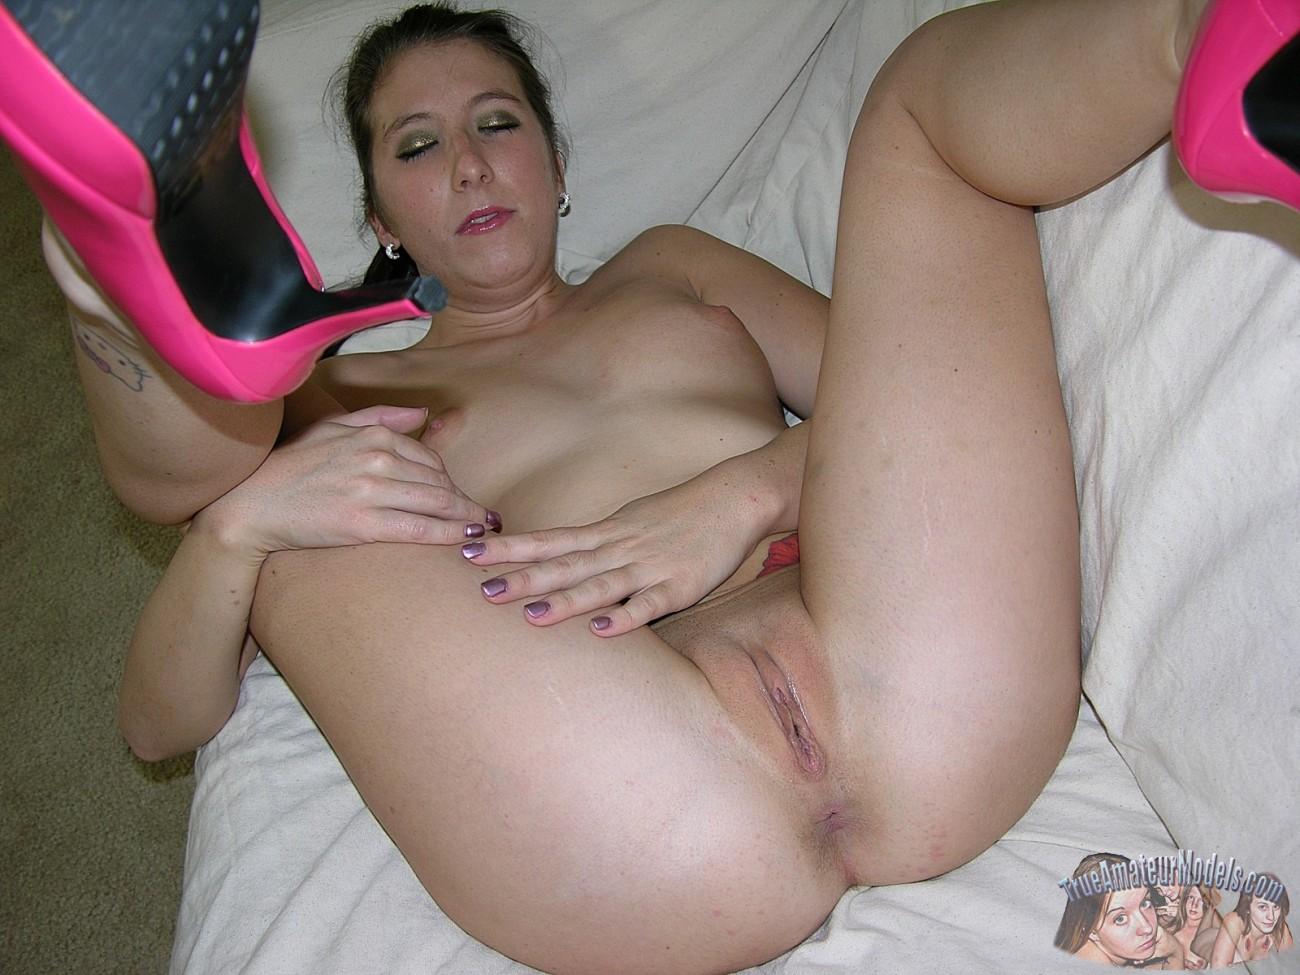 French Amateur Porn